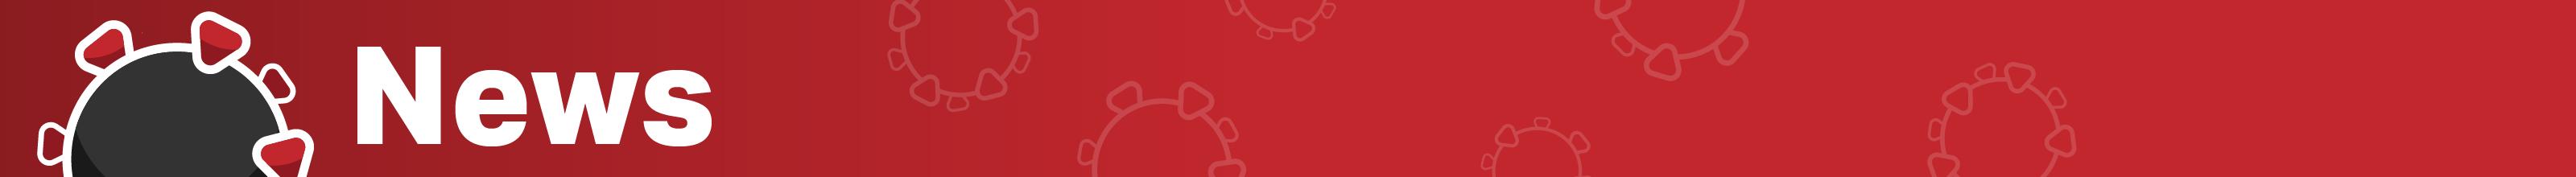 Covid 19 Updates Techcrunch